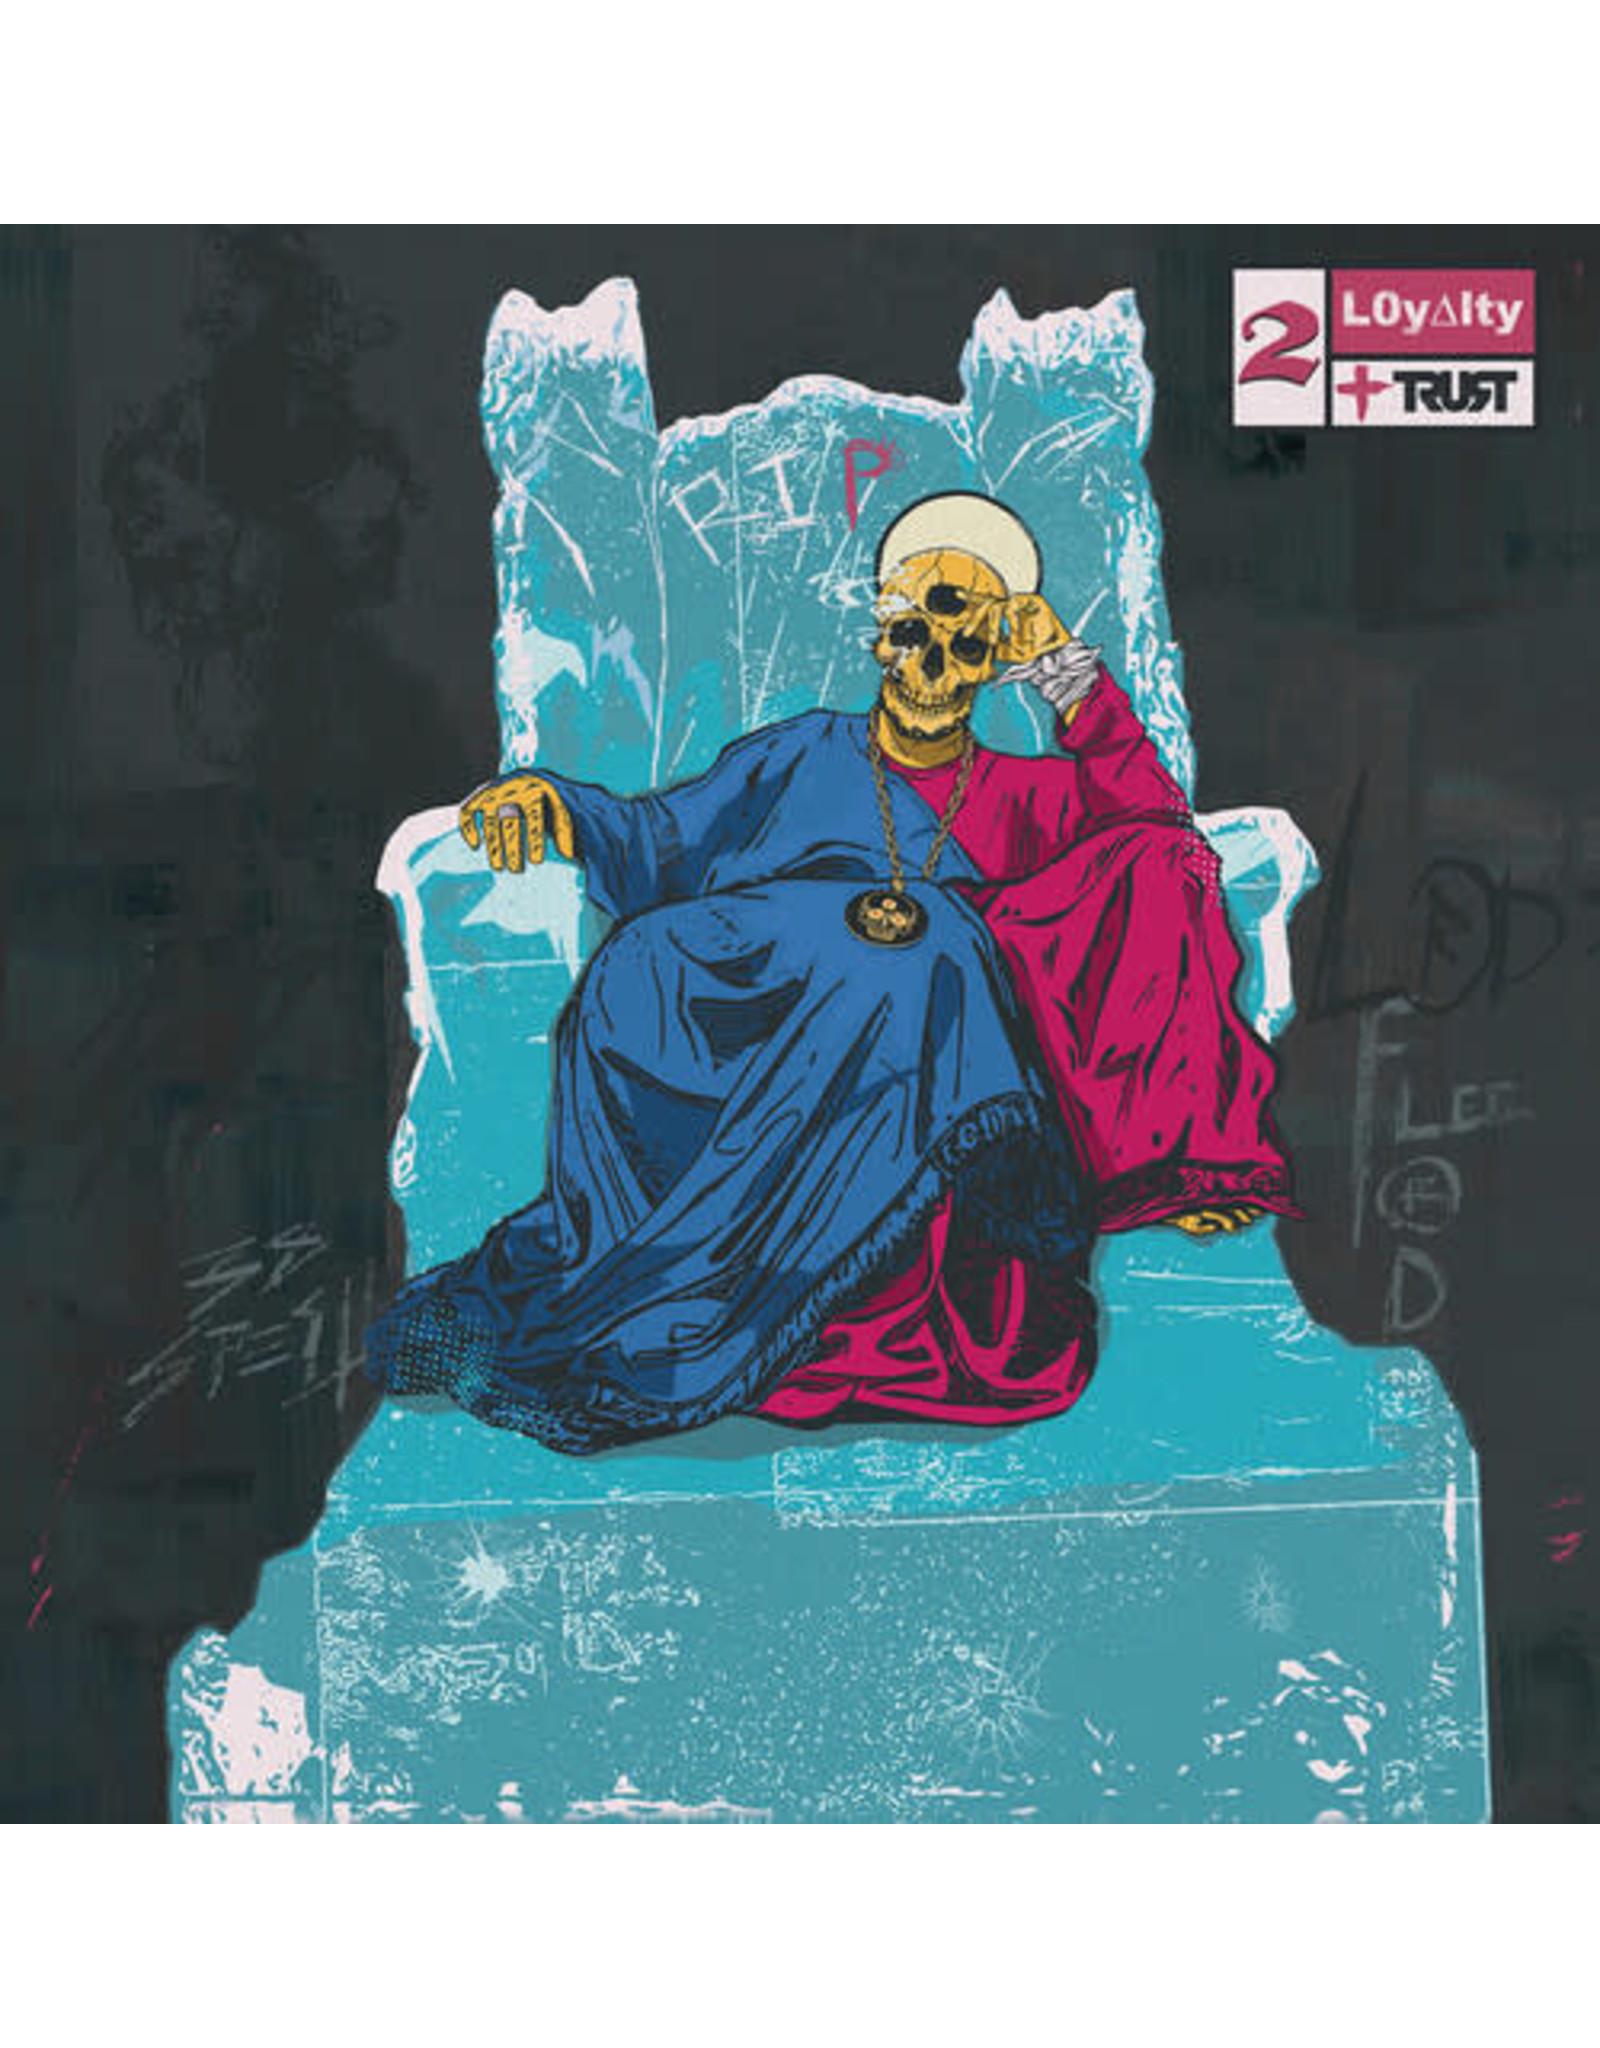 New Vinyl Flee Lord & 38 Spesh - Loyalty & Trust II LP